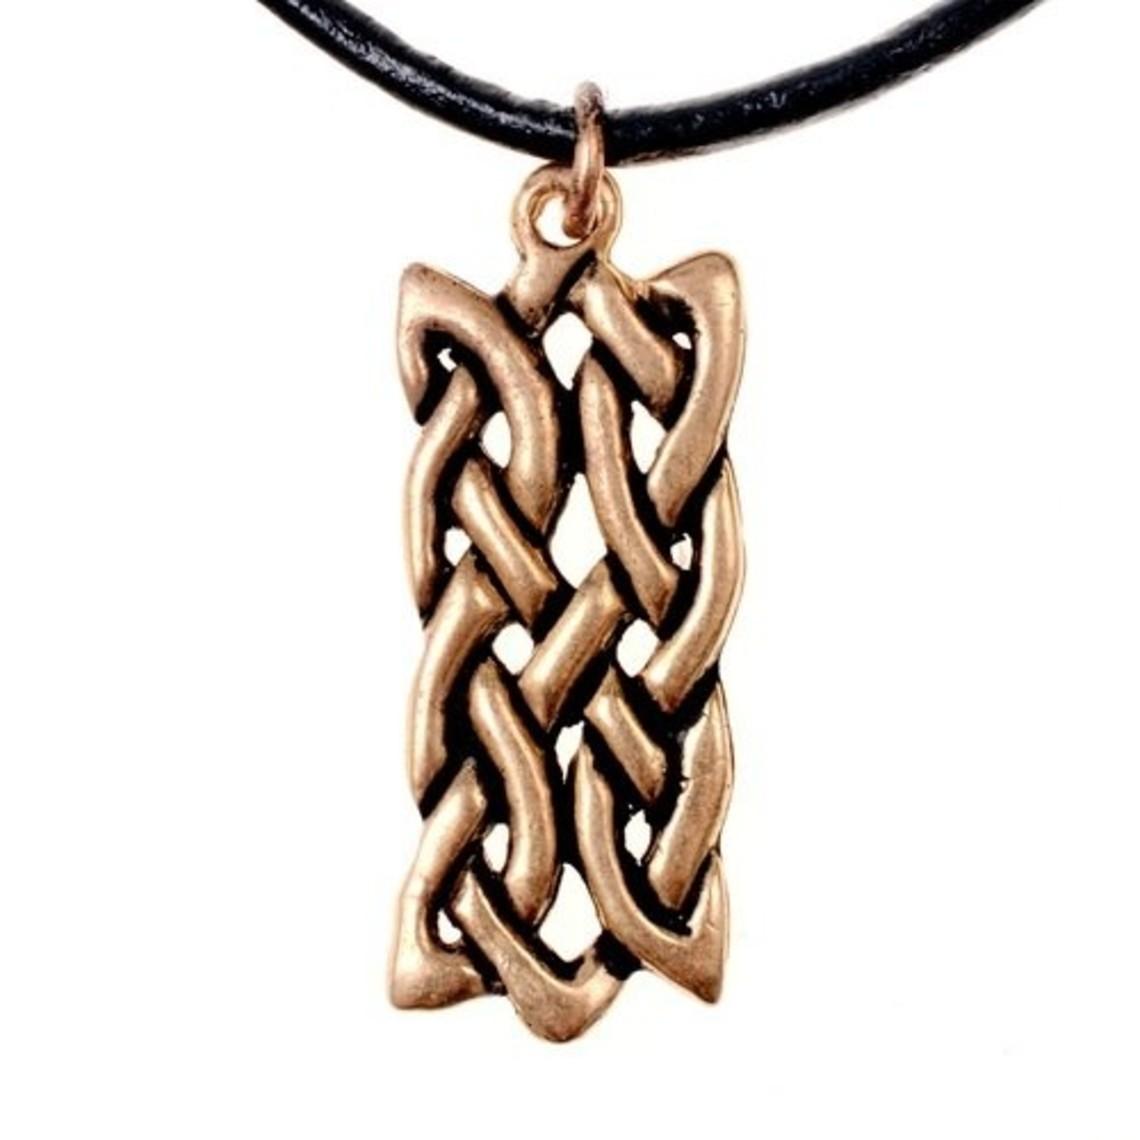 Pendant Celtic rectangular knot motif, bronze